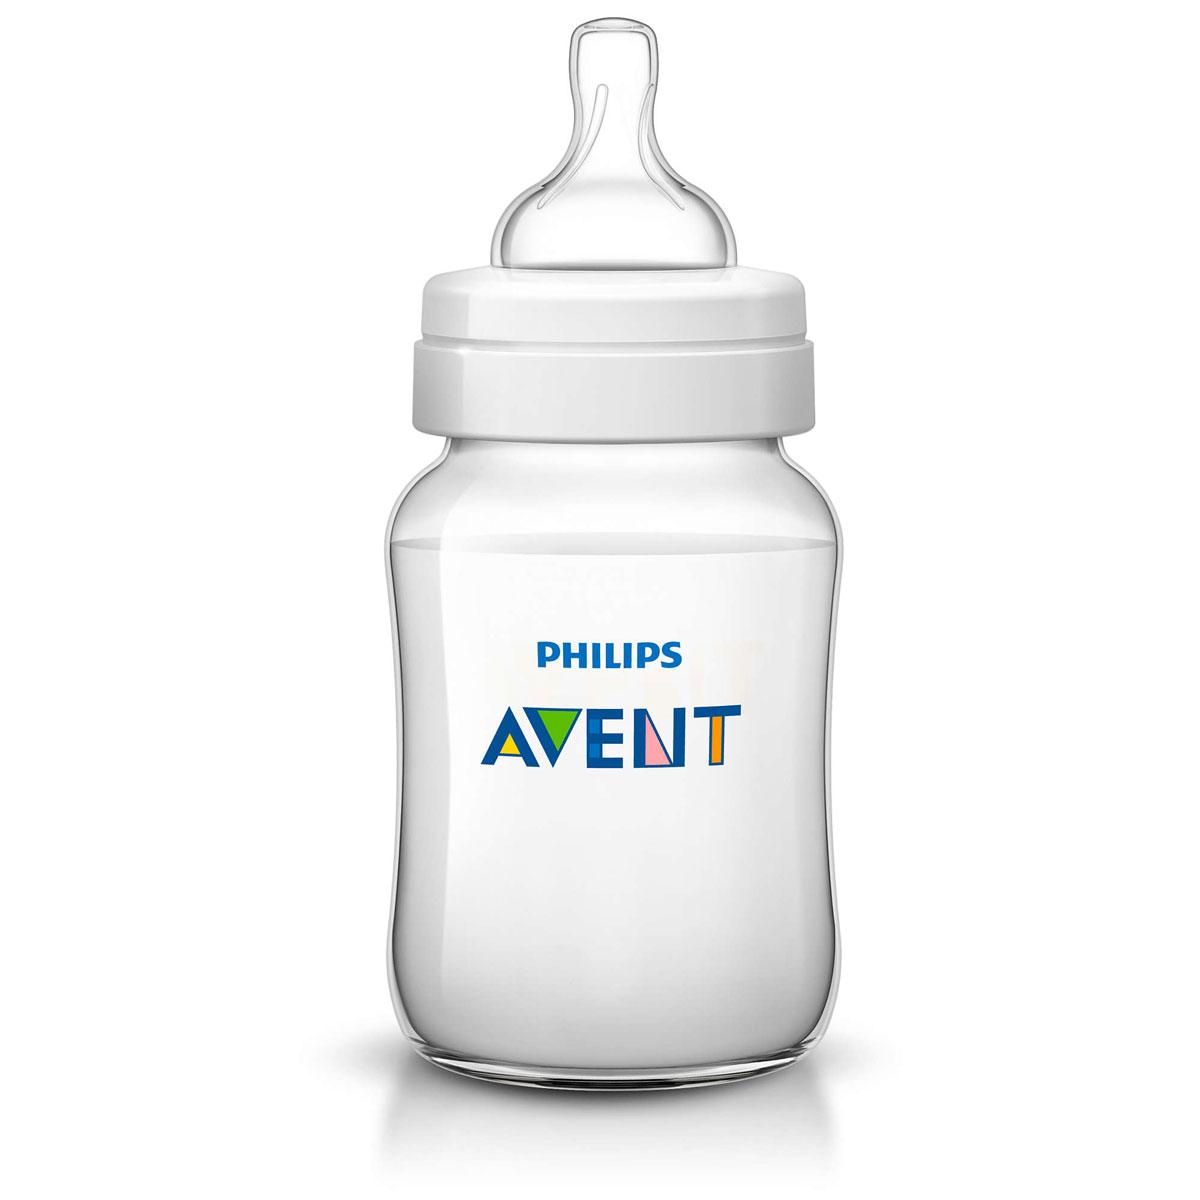 Philips AVENT ��������� ��� ��������� �� 1 ������ 260 �� - Philips AVENTSCF563/17